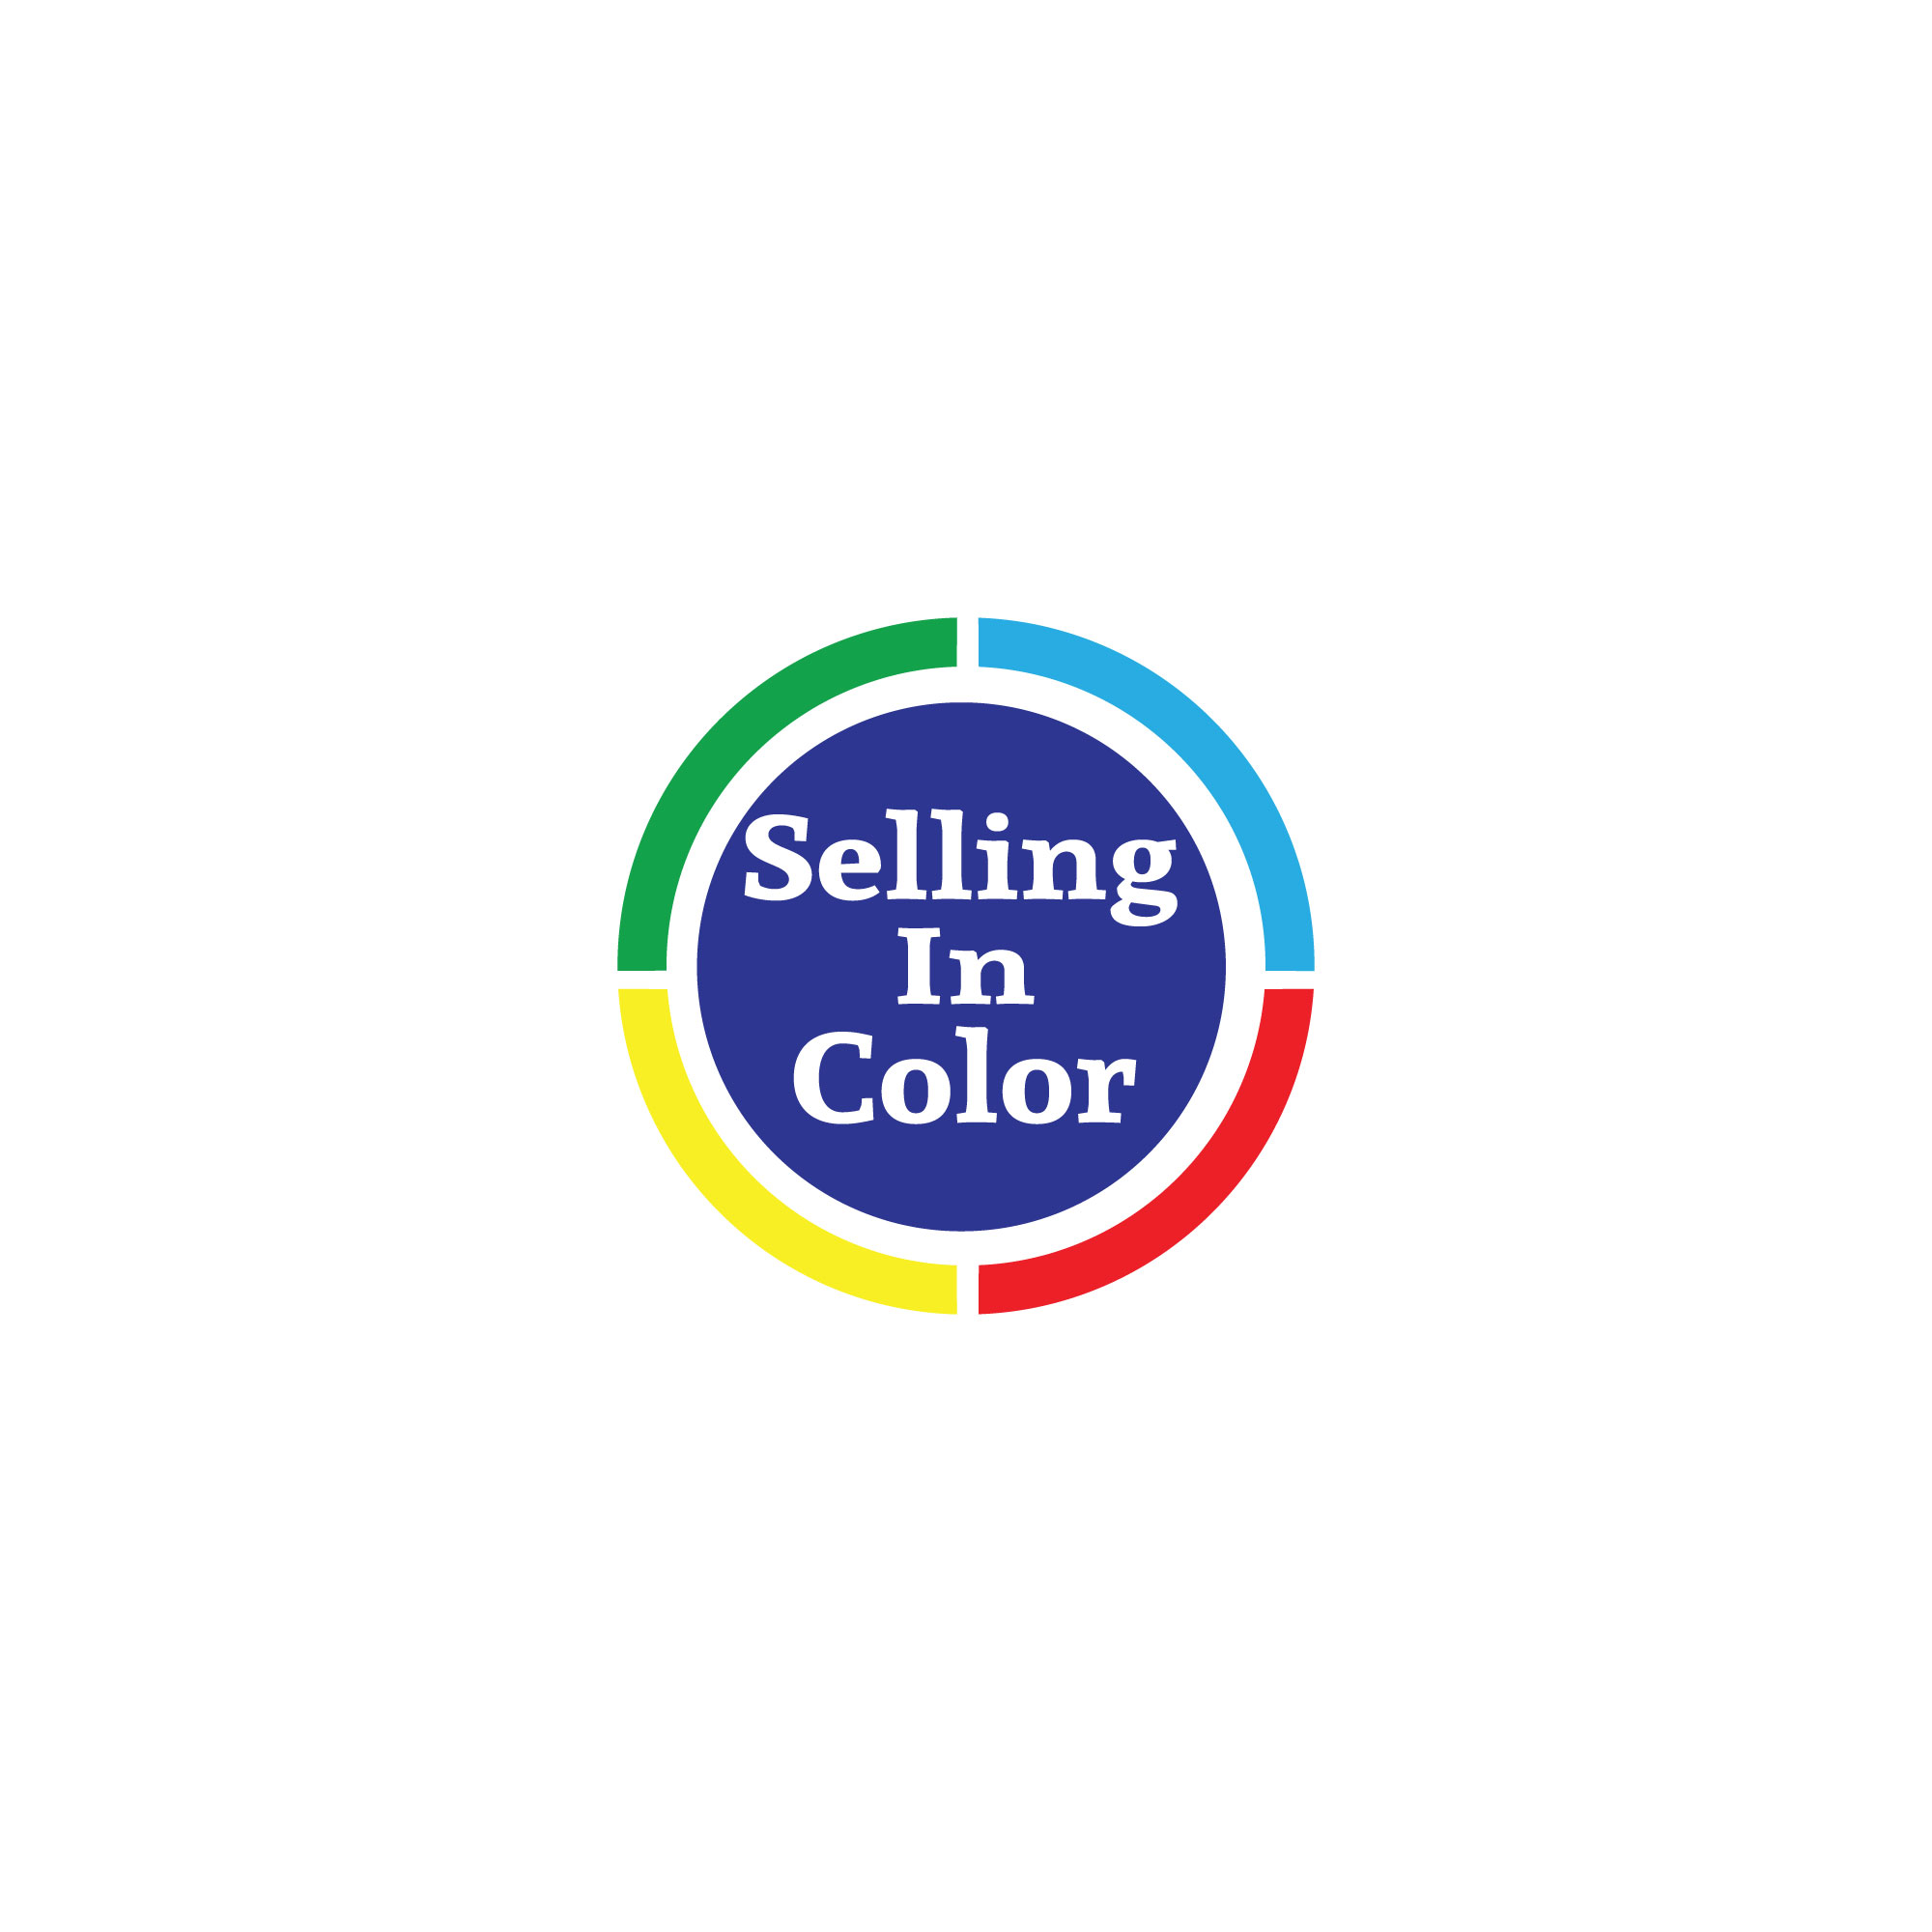 Selling In Color Final Offical JPEG Logo.jpg